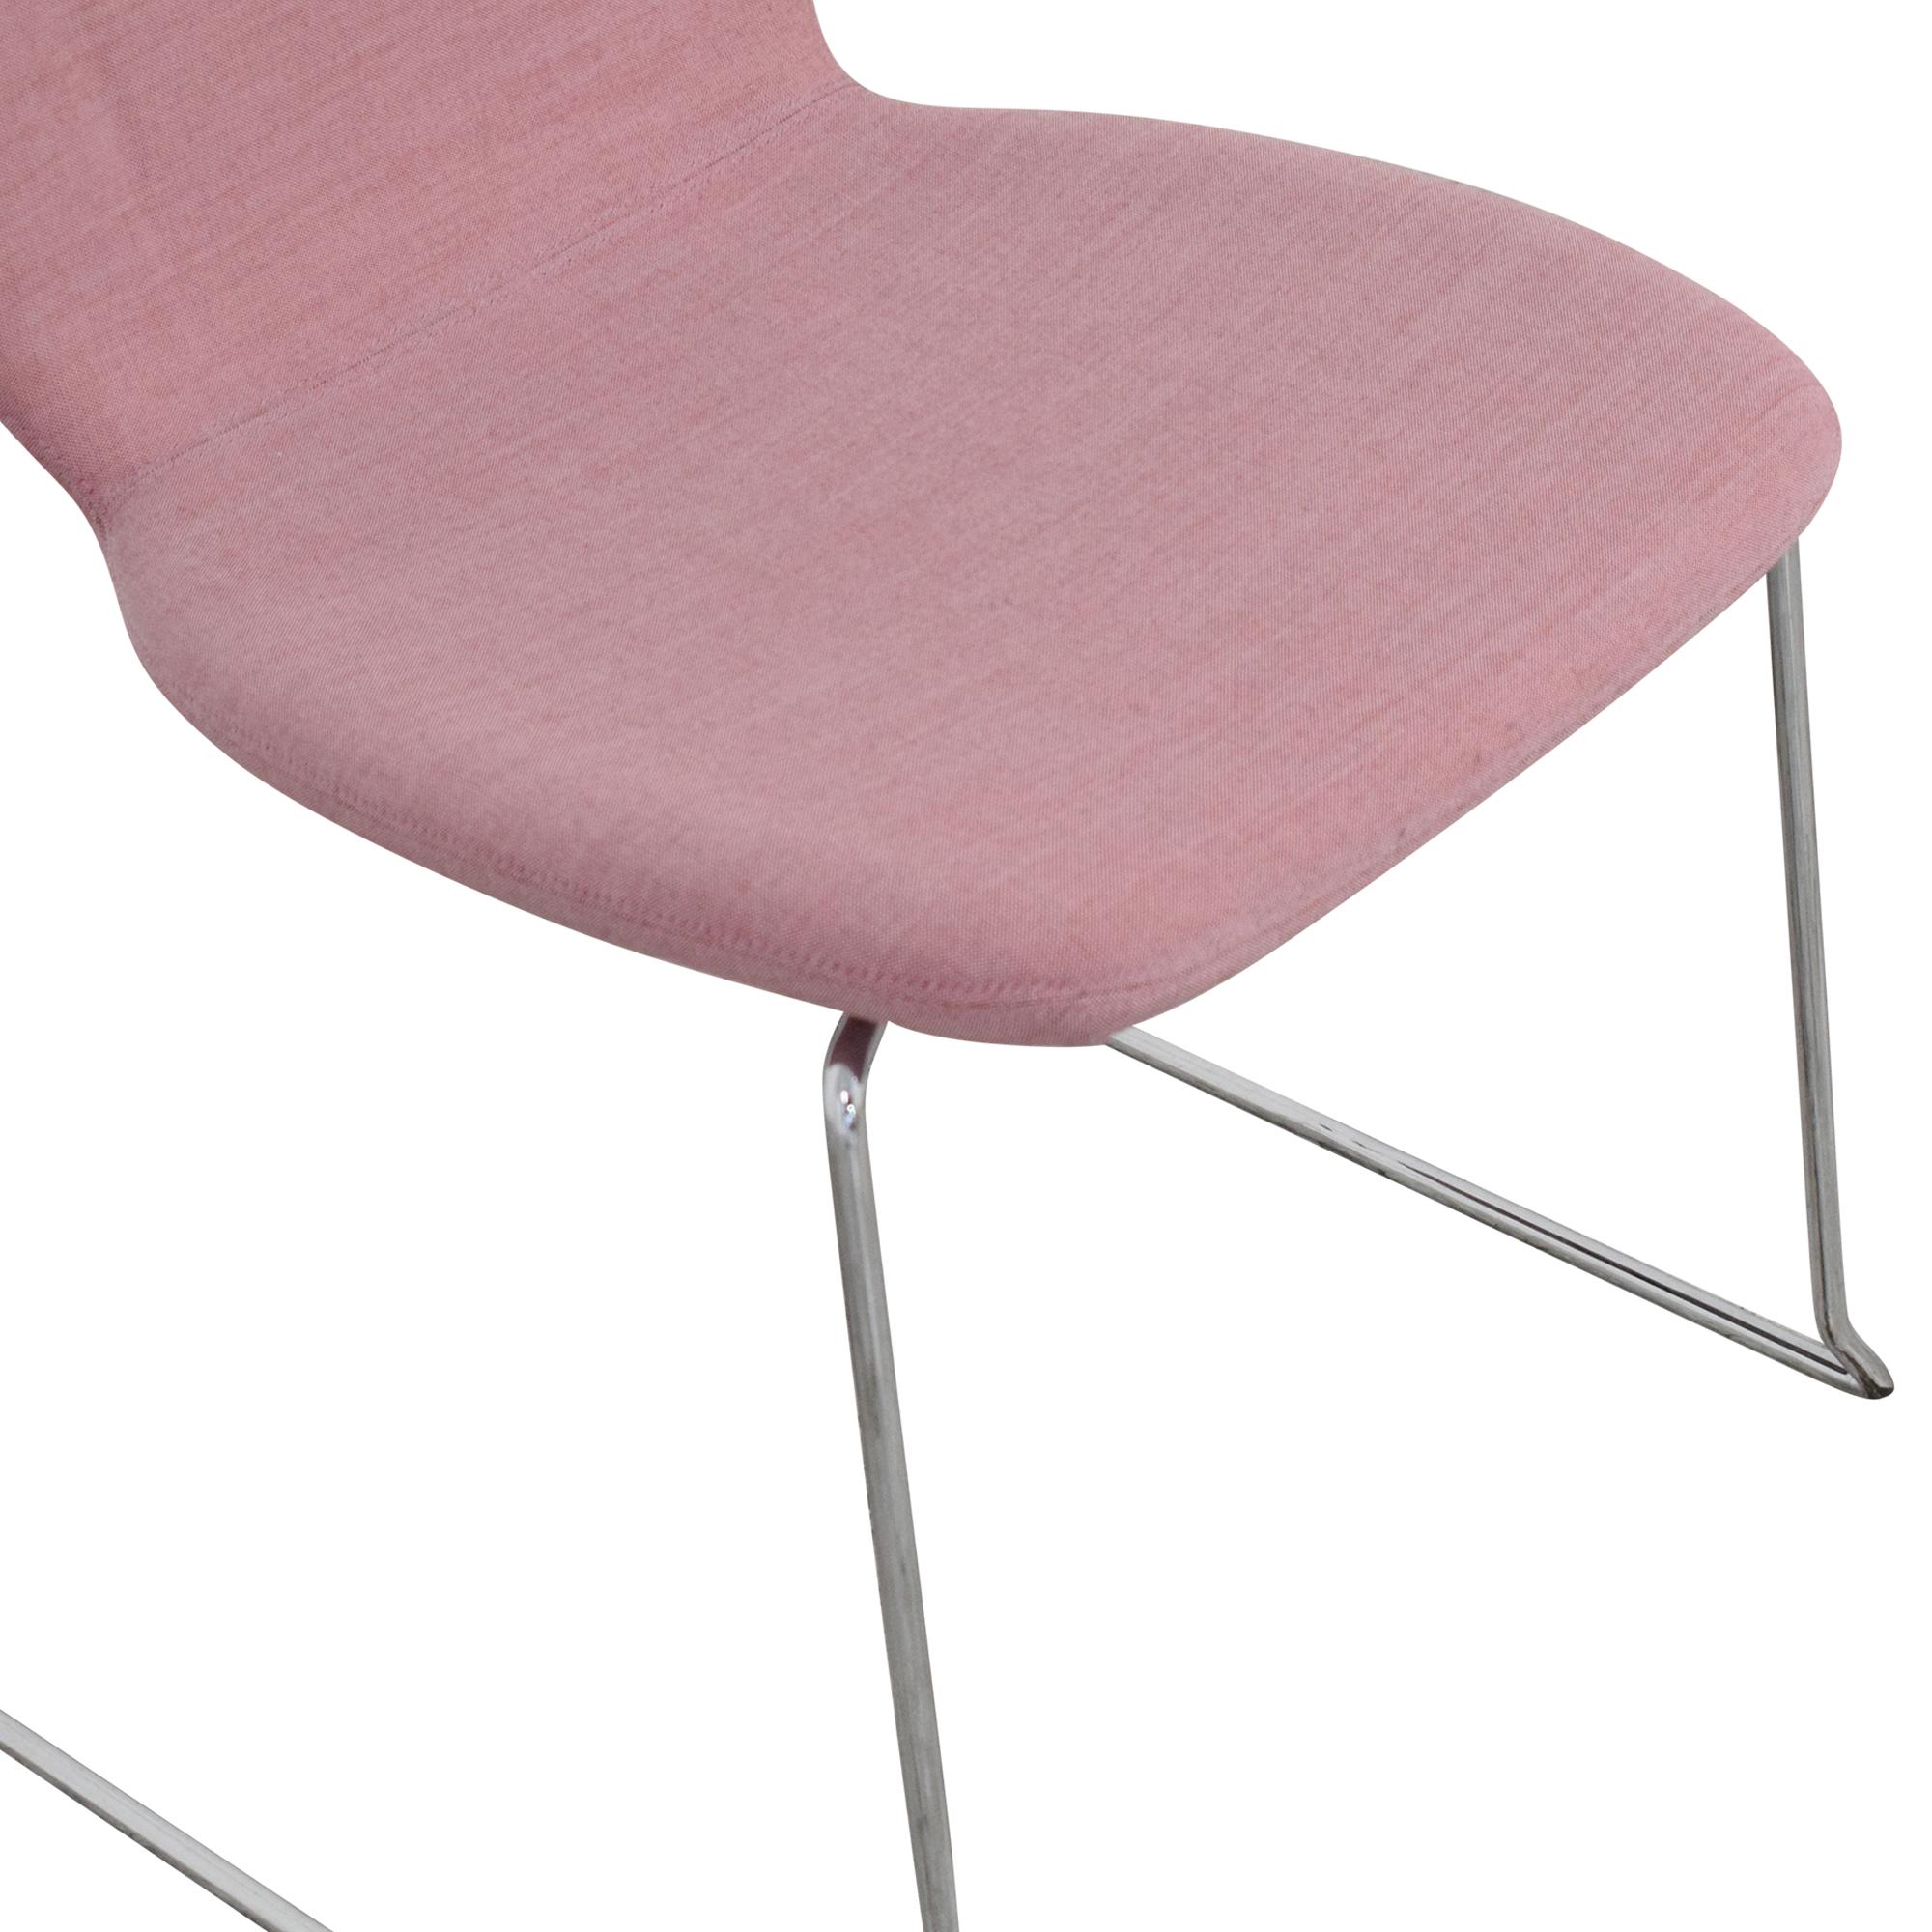 Koleksiyon Koleksiyon Asanda Armless Chair nj